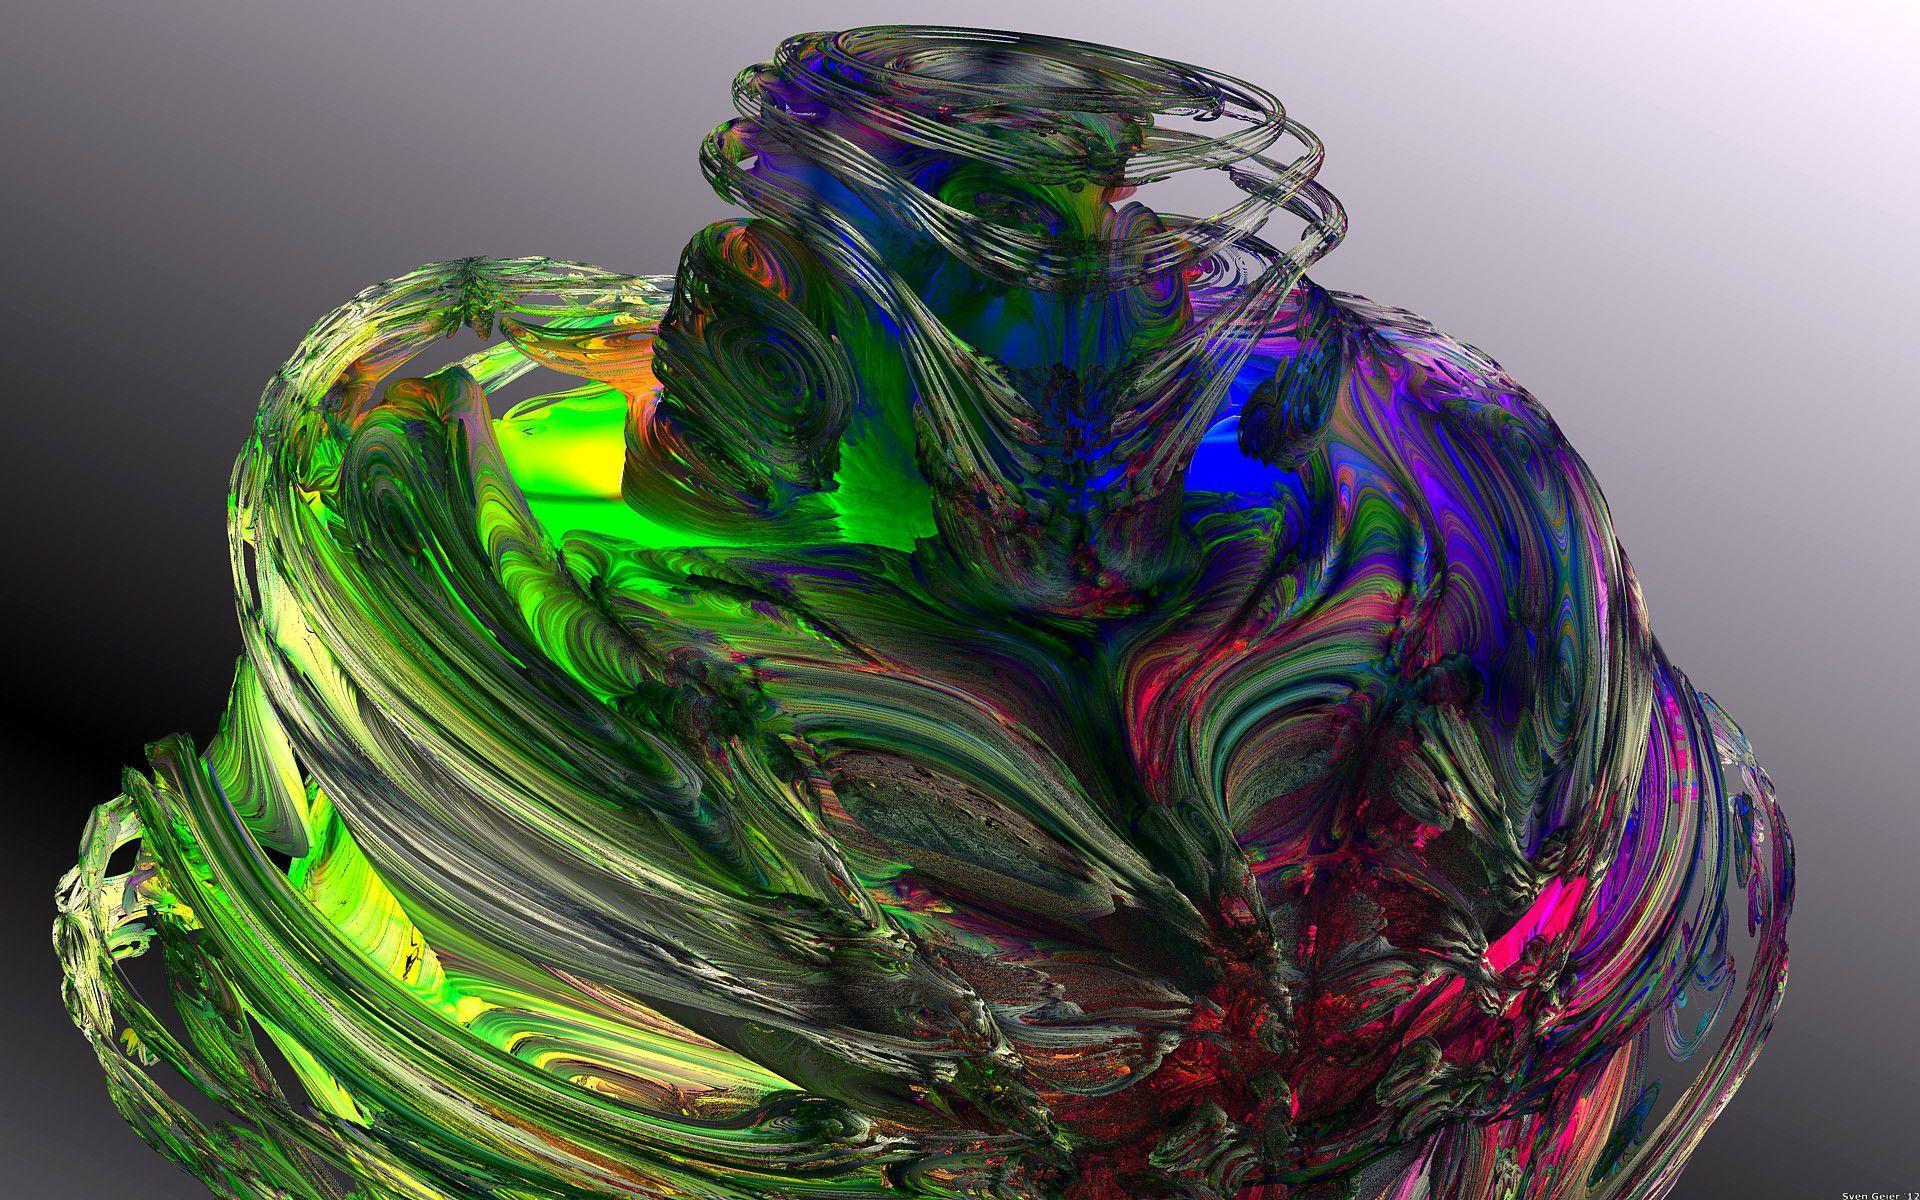 Glassy.jpg (1920×1200)